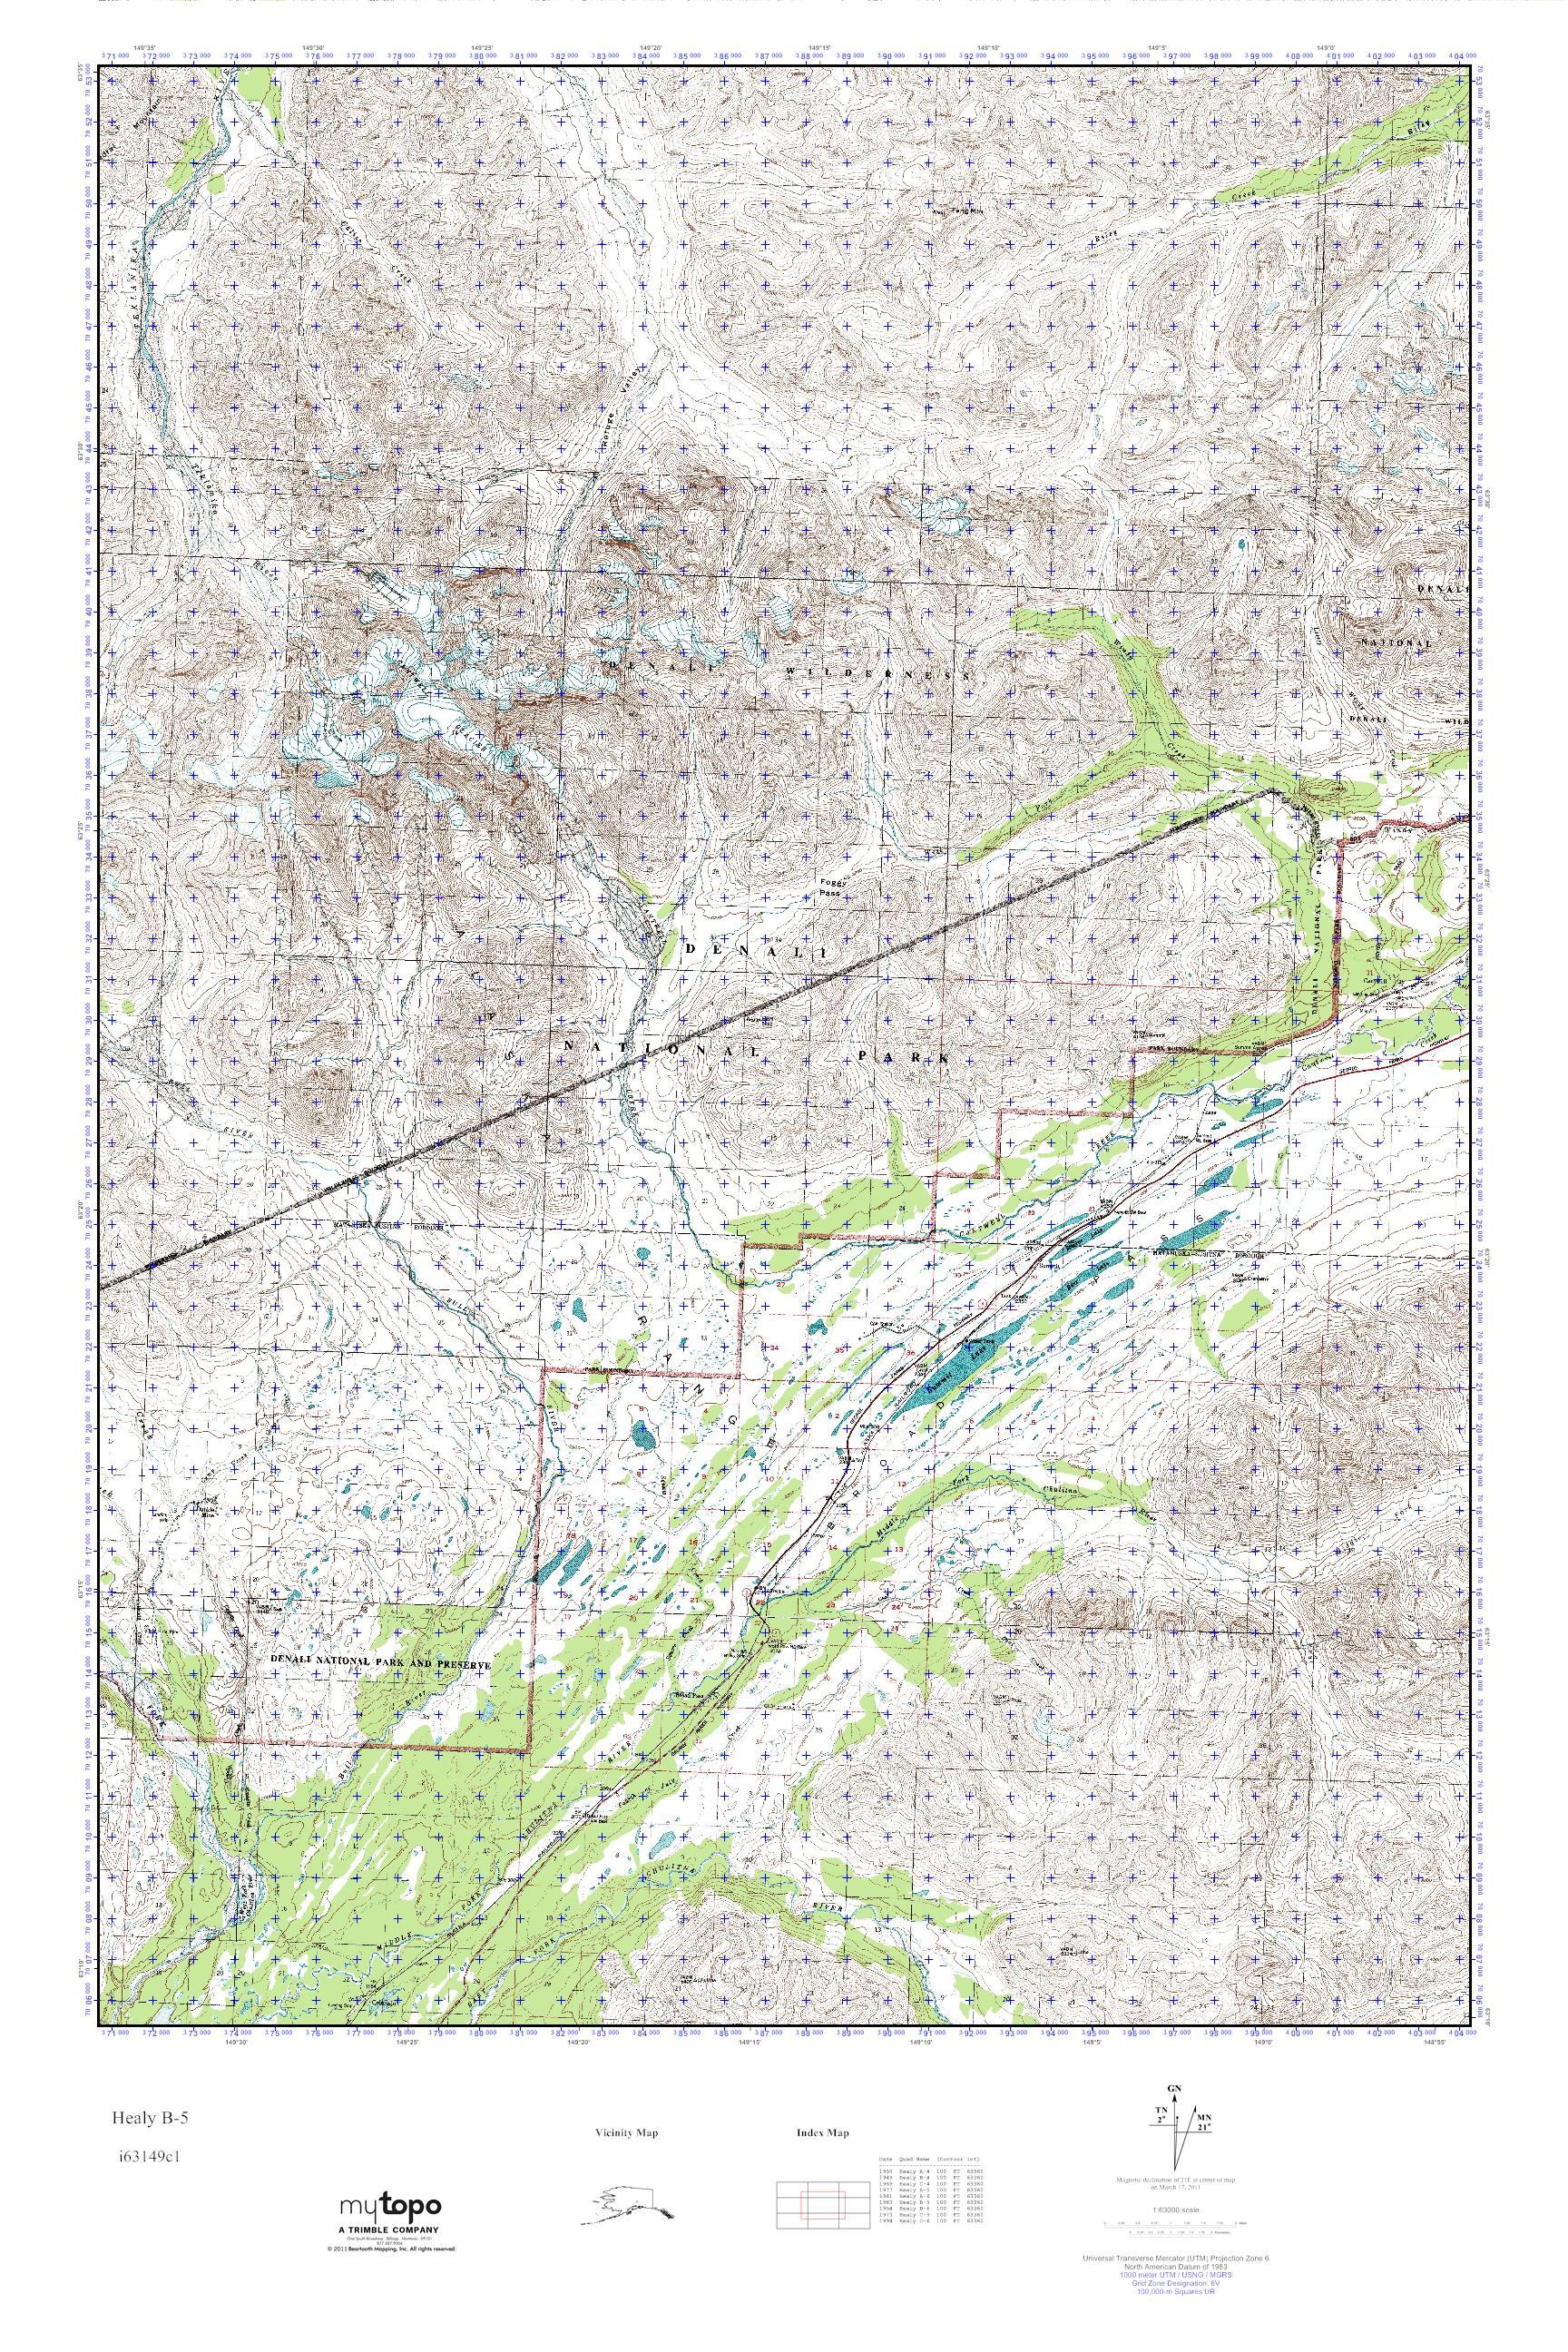 MyTopo Healy B 5 Alaska USGS Quad Topo Map